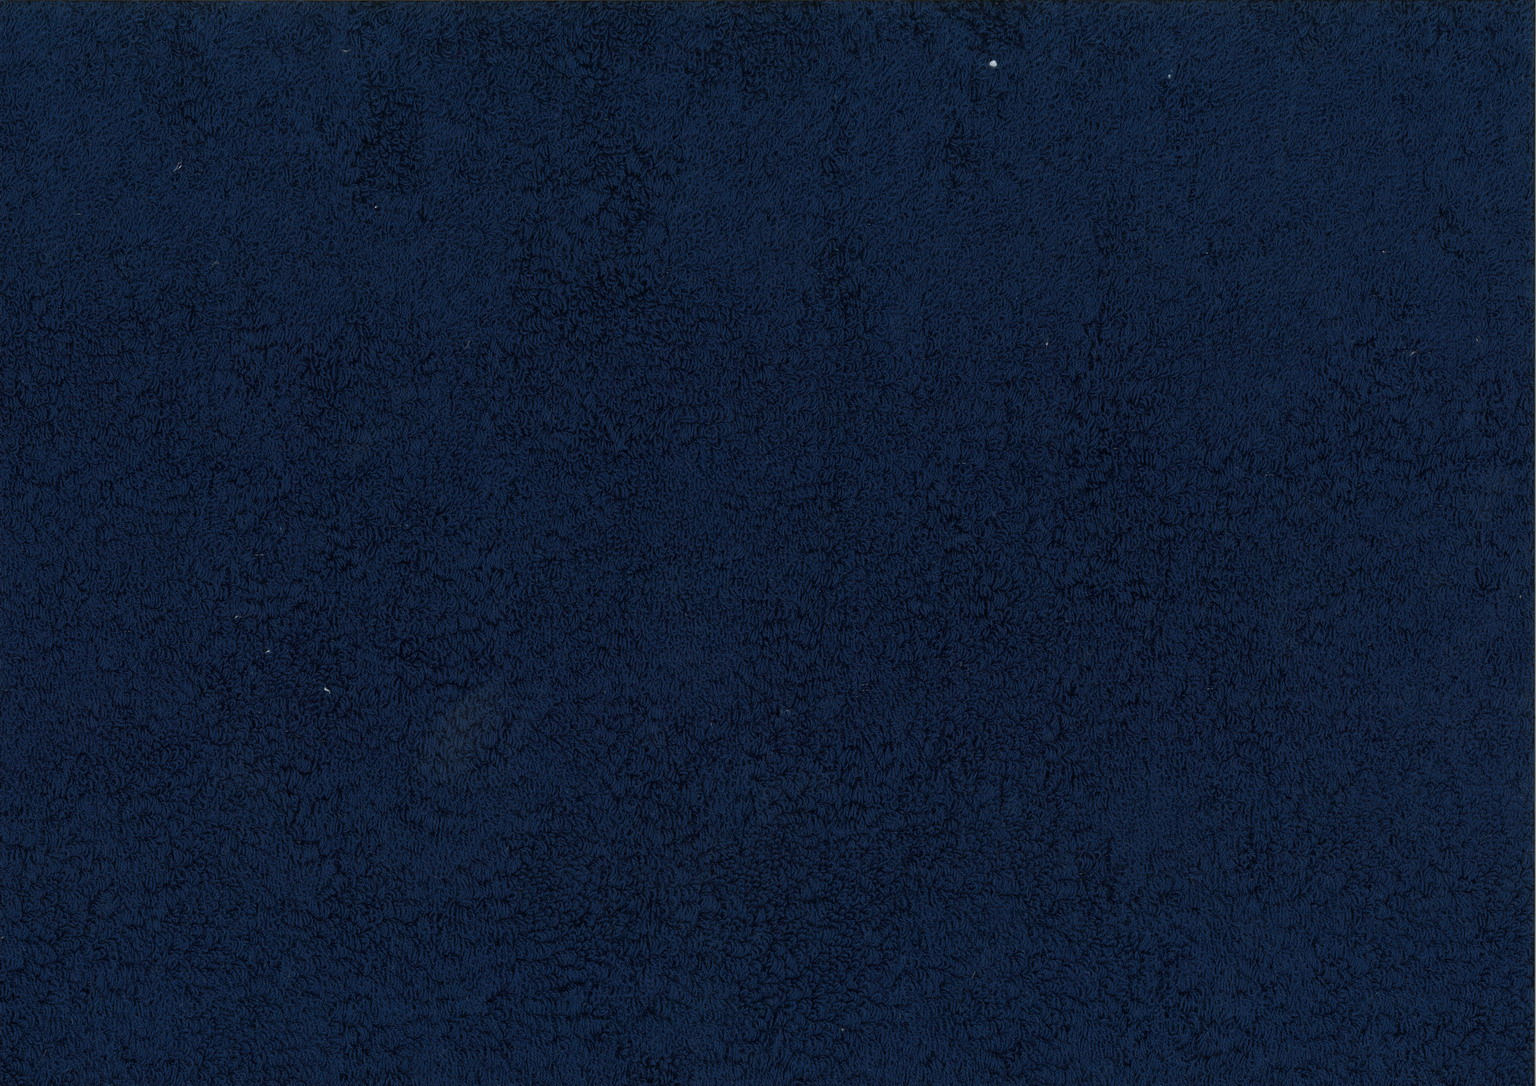 FLORIDA Blue Navy